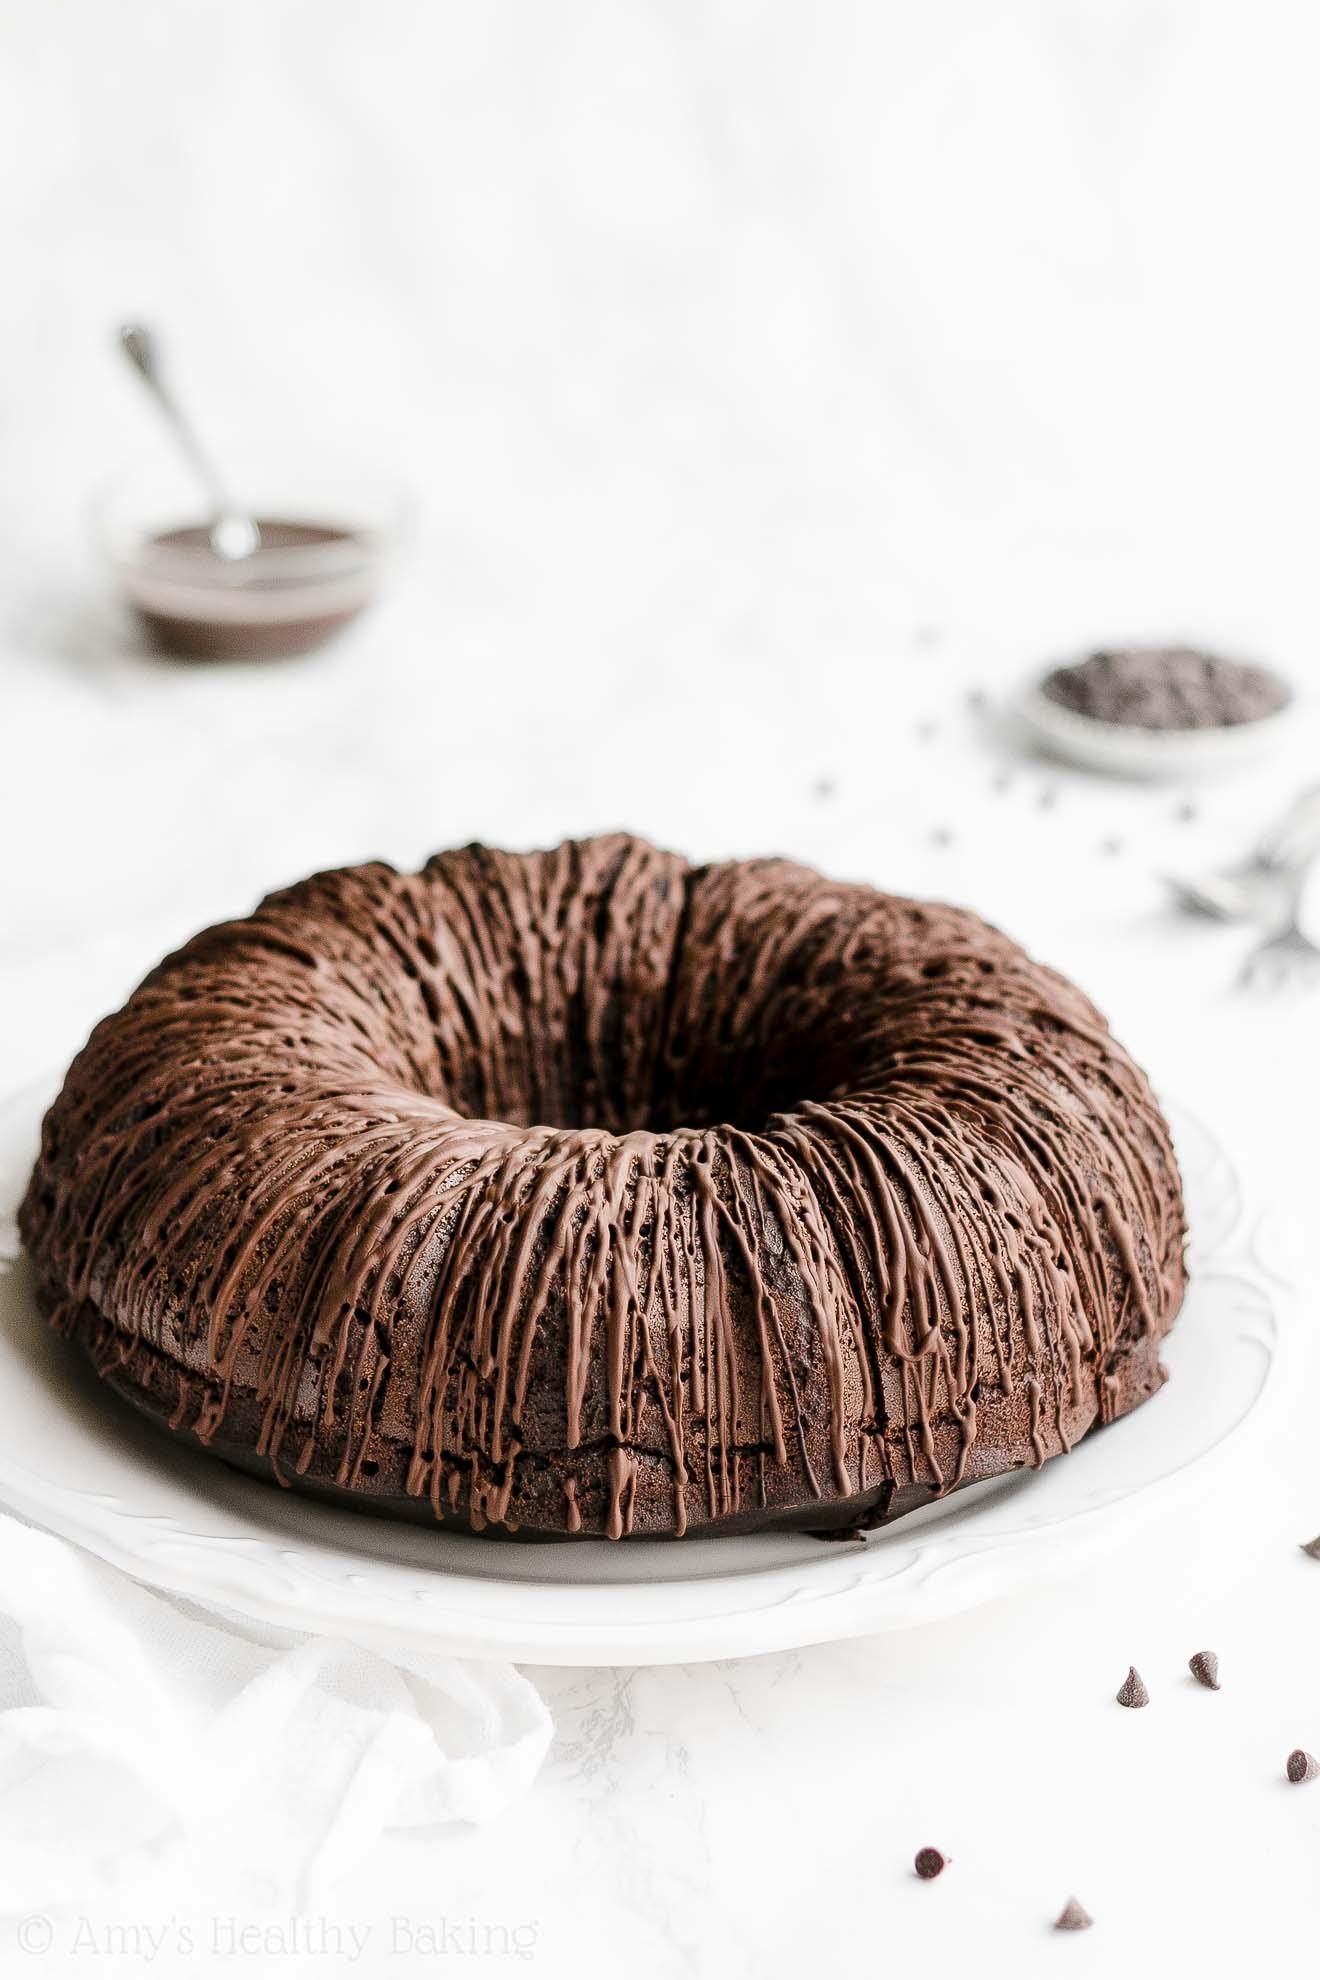 ULTIMATE Best Ever Healthy Gluten Free Sugar Free Chocolate Bundt Cake